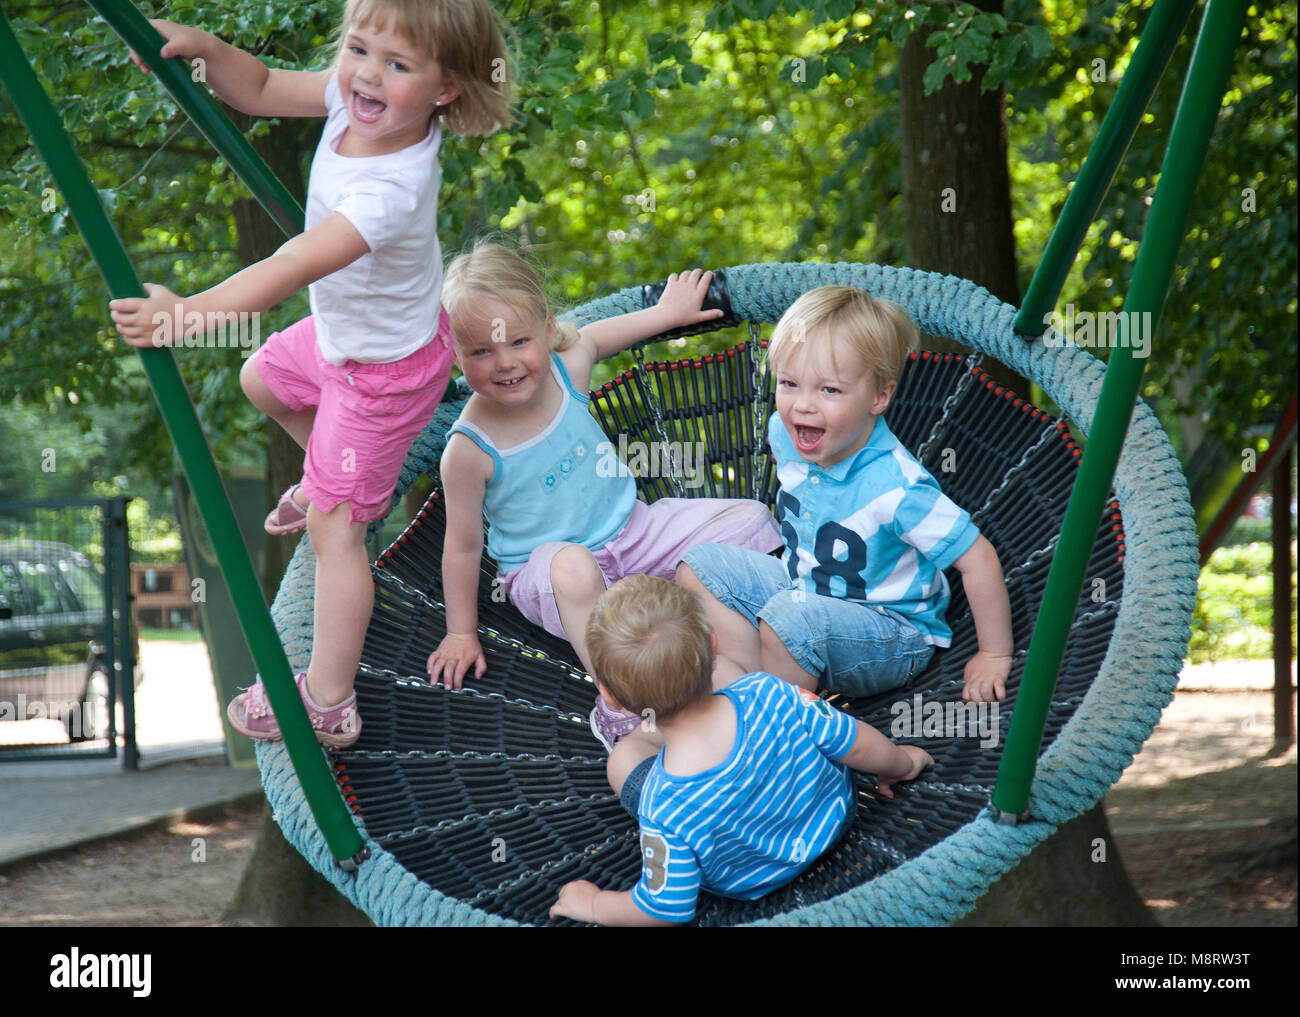 Katholischer, integrativer Kindergarten 'St. Maria - Frieden'   Kinder schaukeln - Stock Image